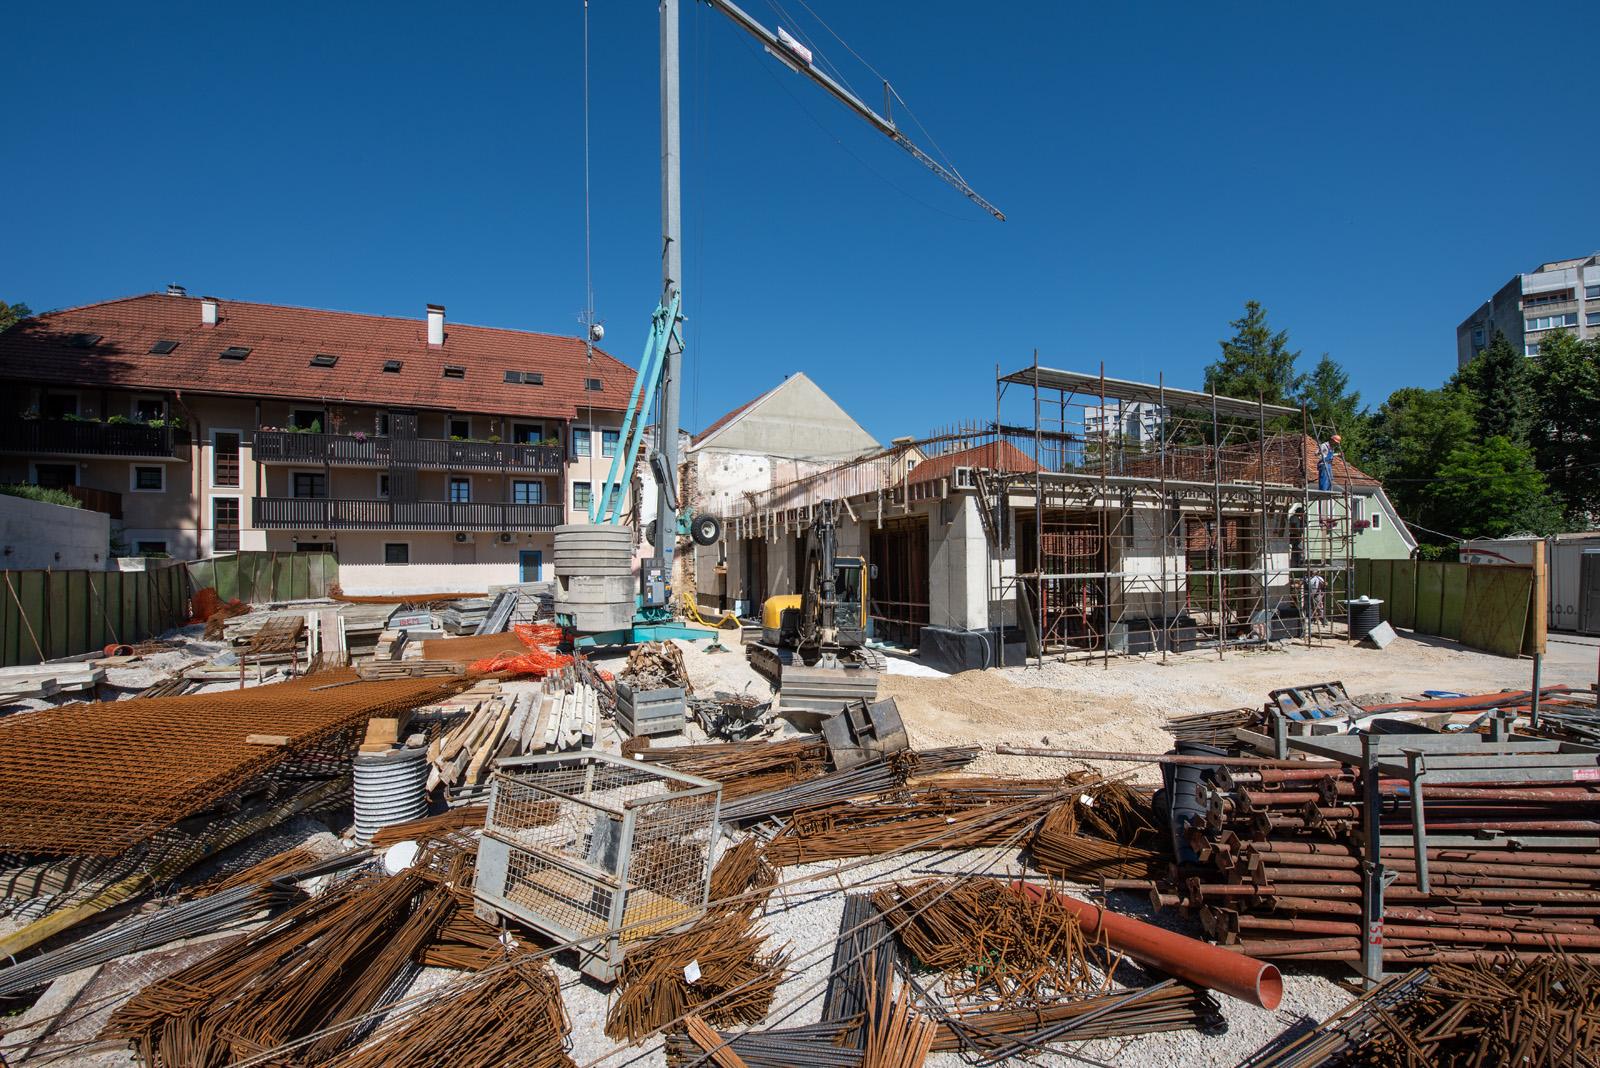 Gradnja stavbe pri projektu CTN Stari trg 11 v tretji fazi